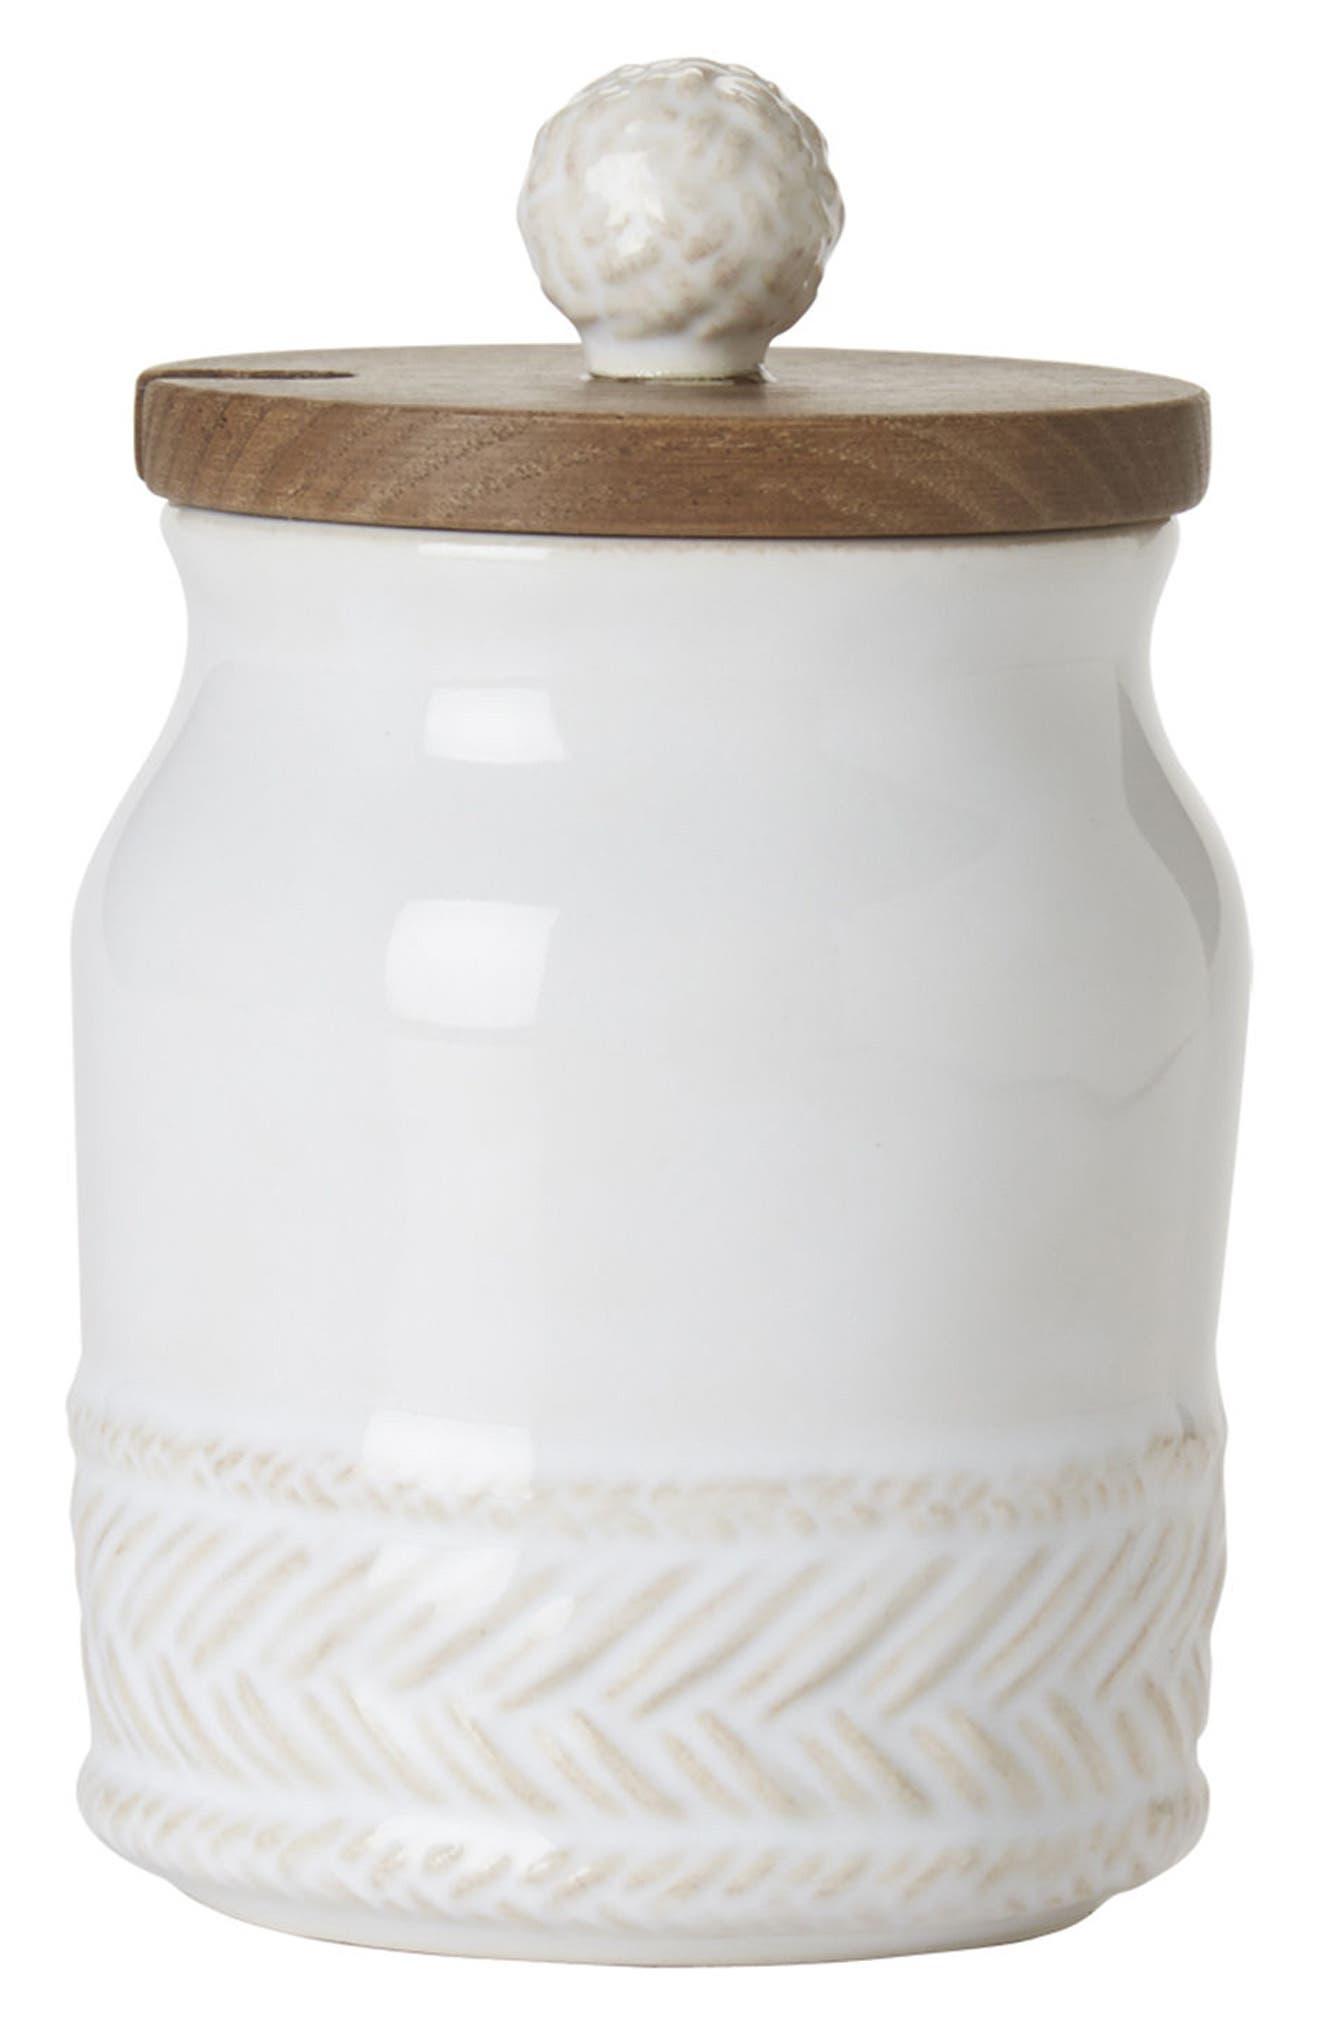 Alternate Image 1 Selected - Juliska Le Panier Ceramic Sugar Pot